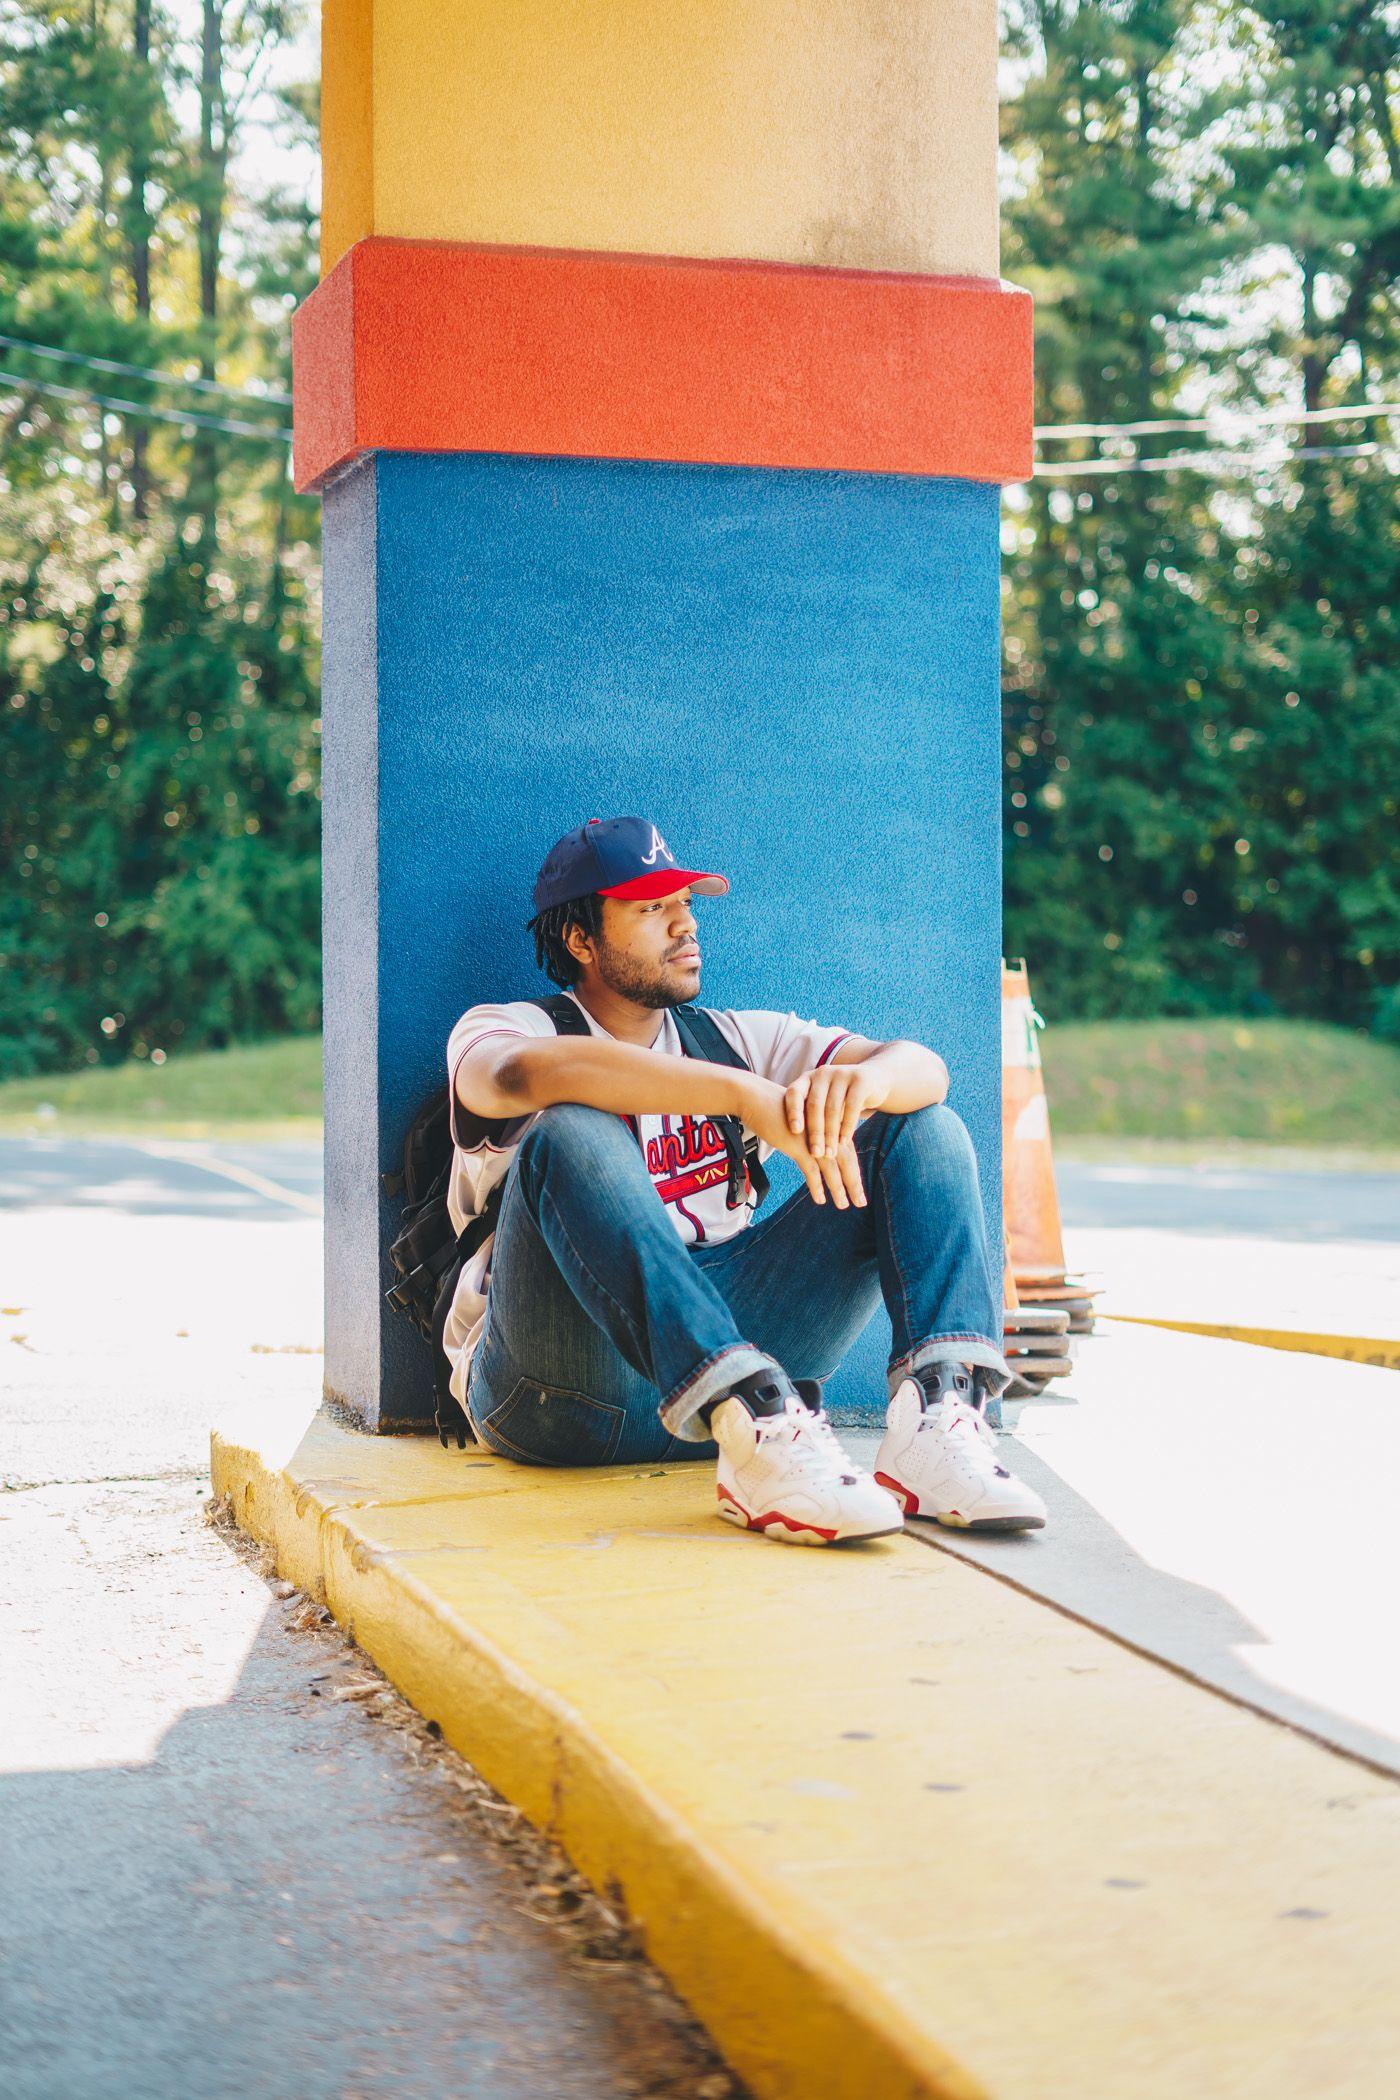 Photo Of Rapper Zane Smith Of Lithonia Georgia Hiphop Rap Music Rappers Poets Photography Portrait Portraits Candidphot Seven Music Zane Rap Albums